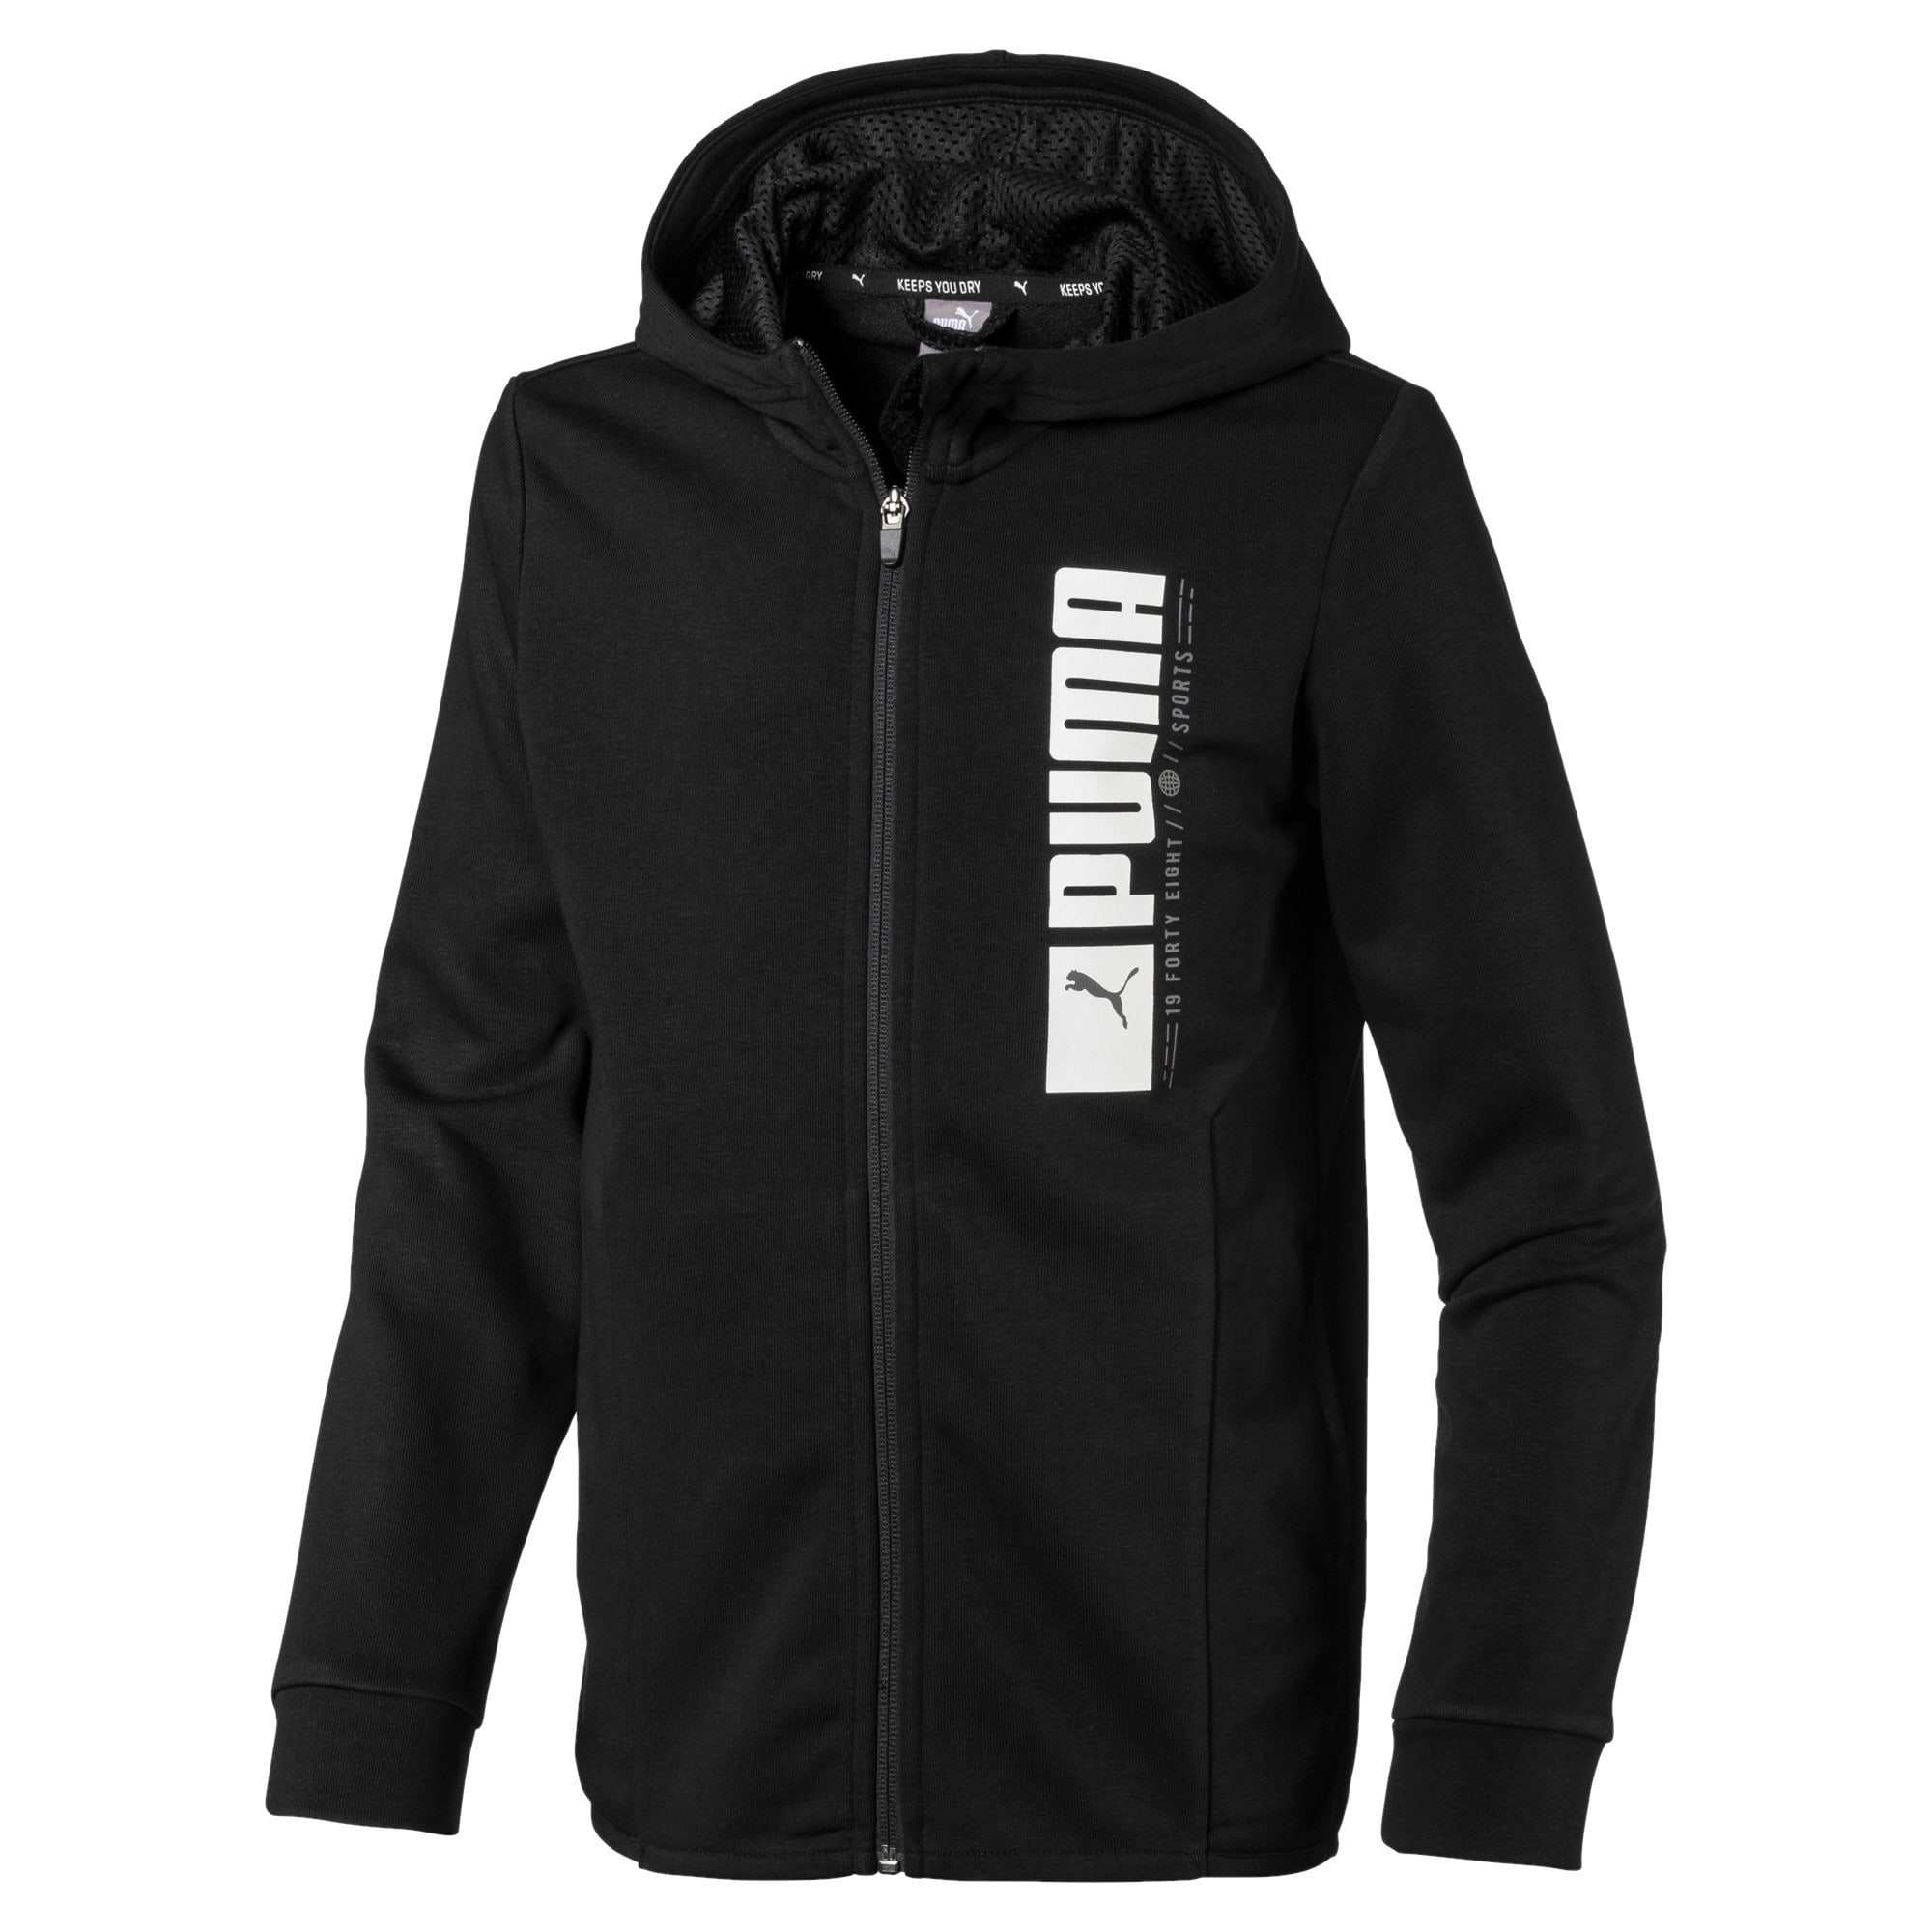 Thumbnail 1 of Active Sports Hooded Jacket, Puma Black, medium-IND